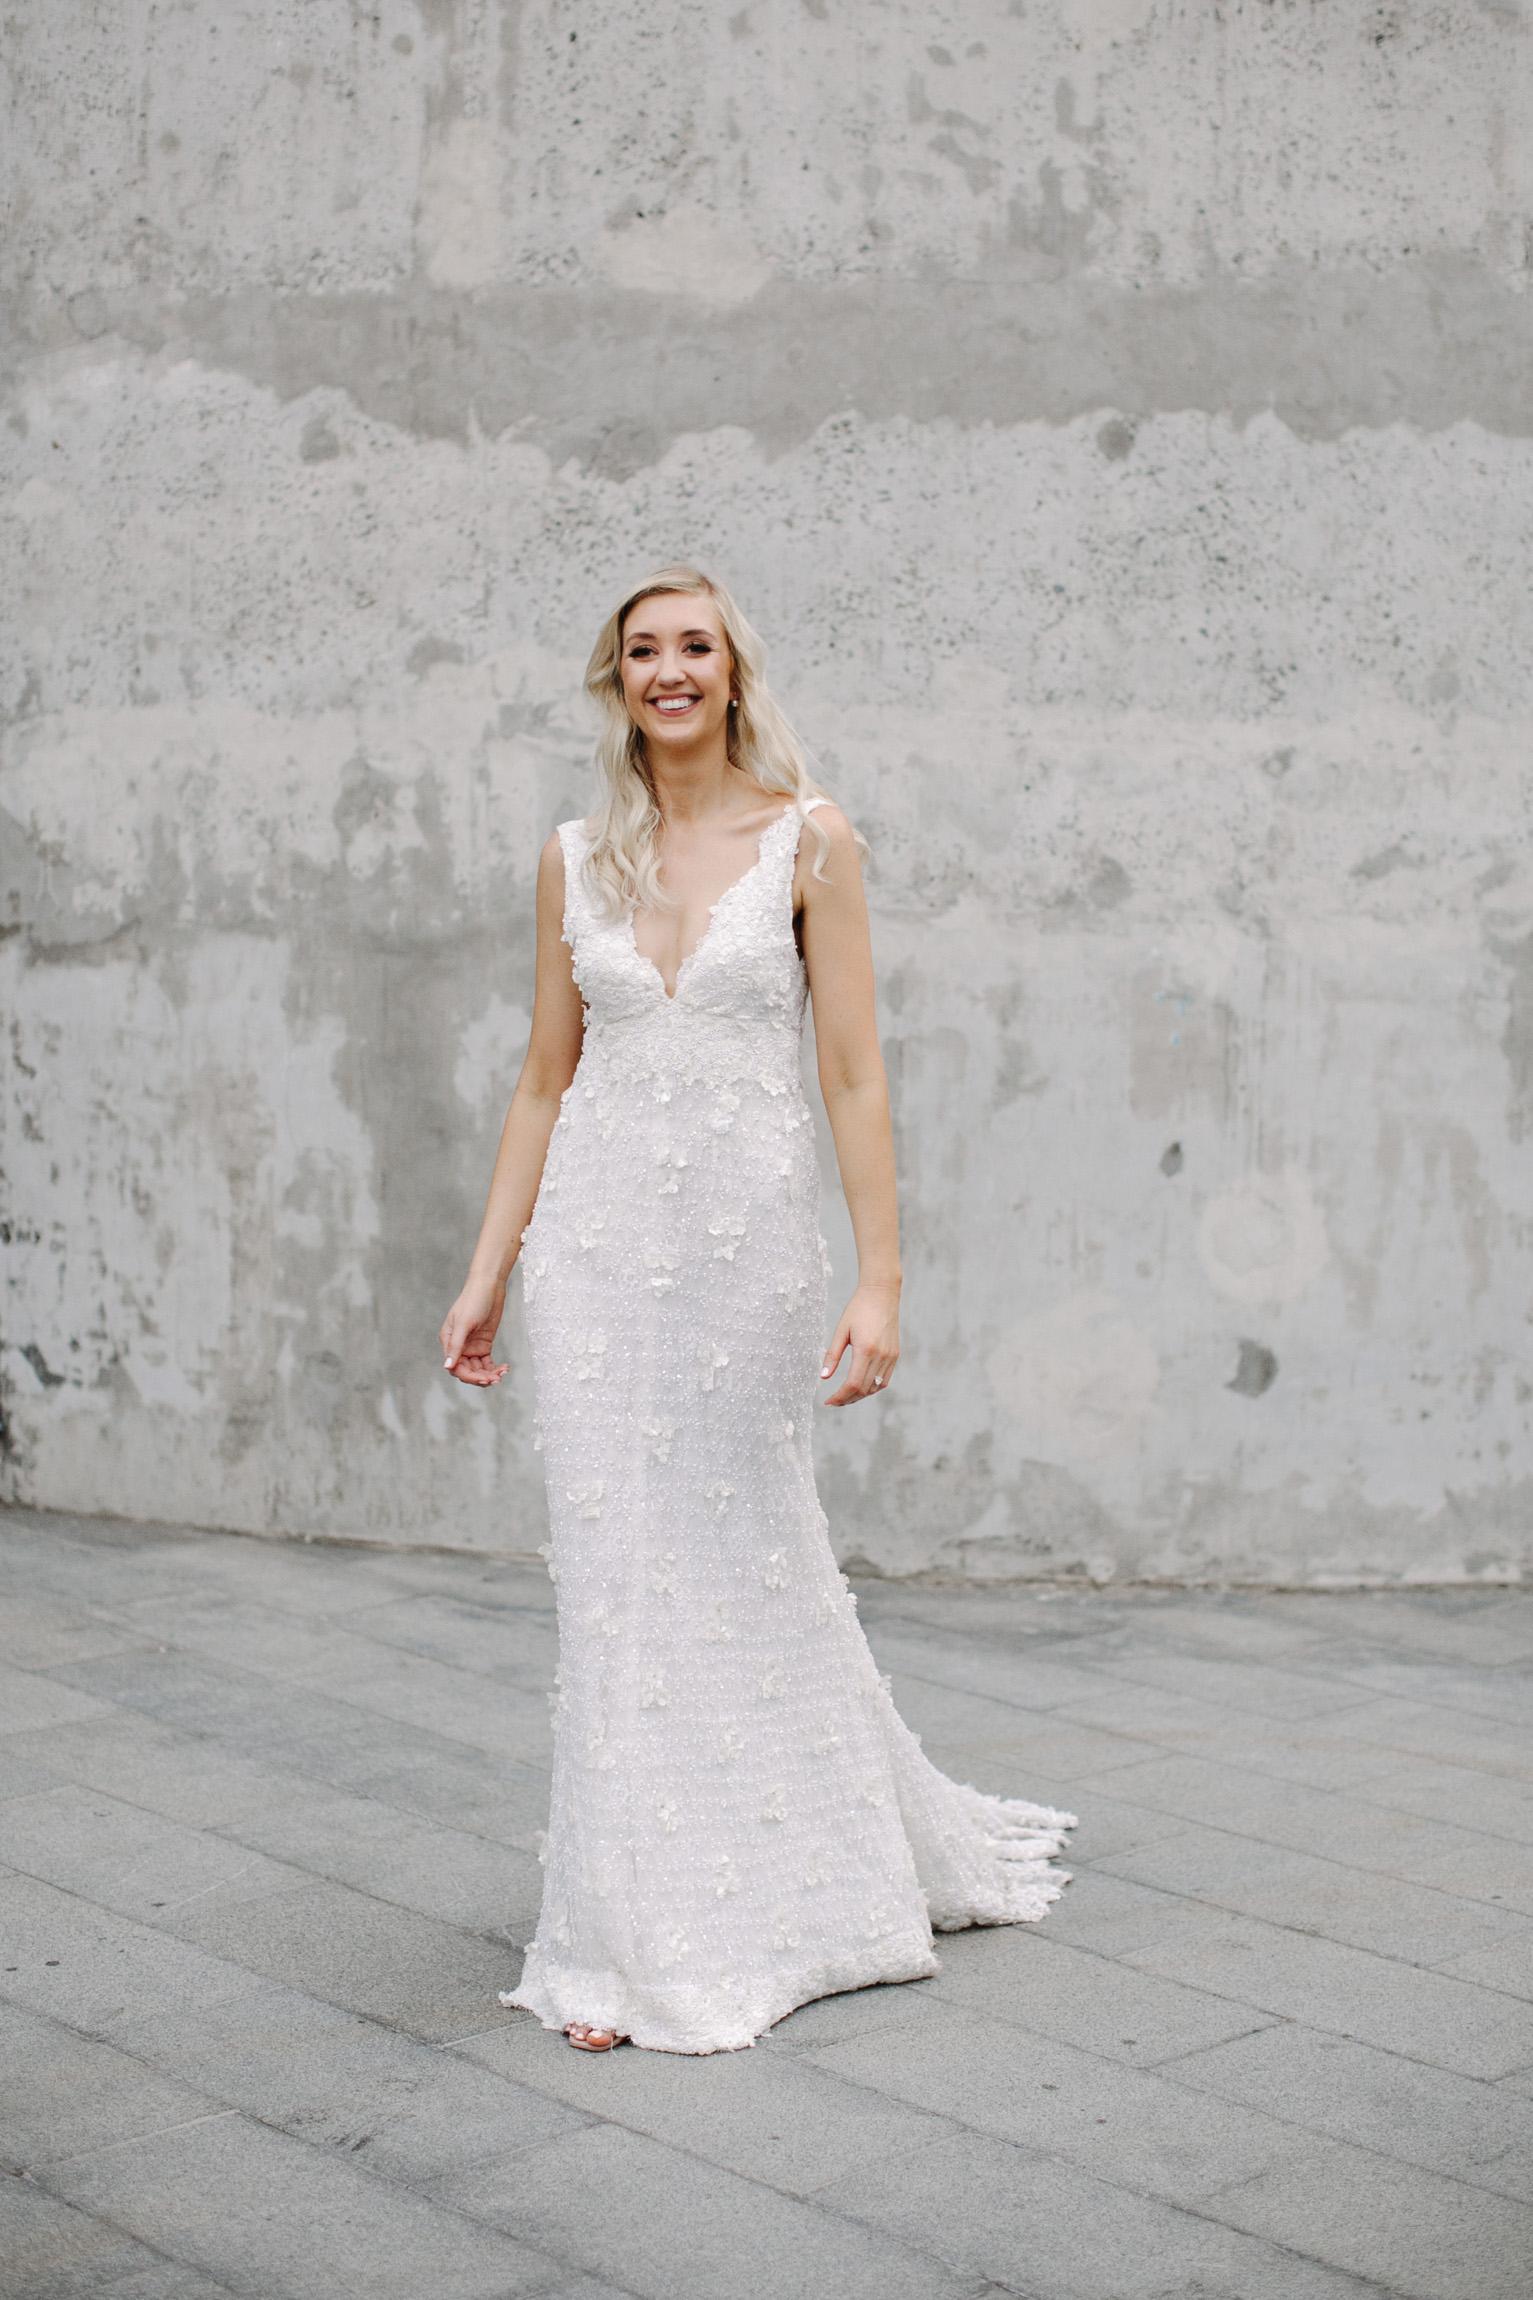 180223_justinaaron_wedding_charlotte_david_h-210.jpg